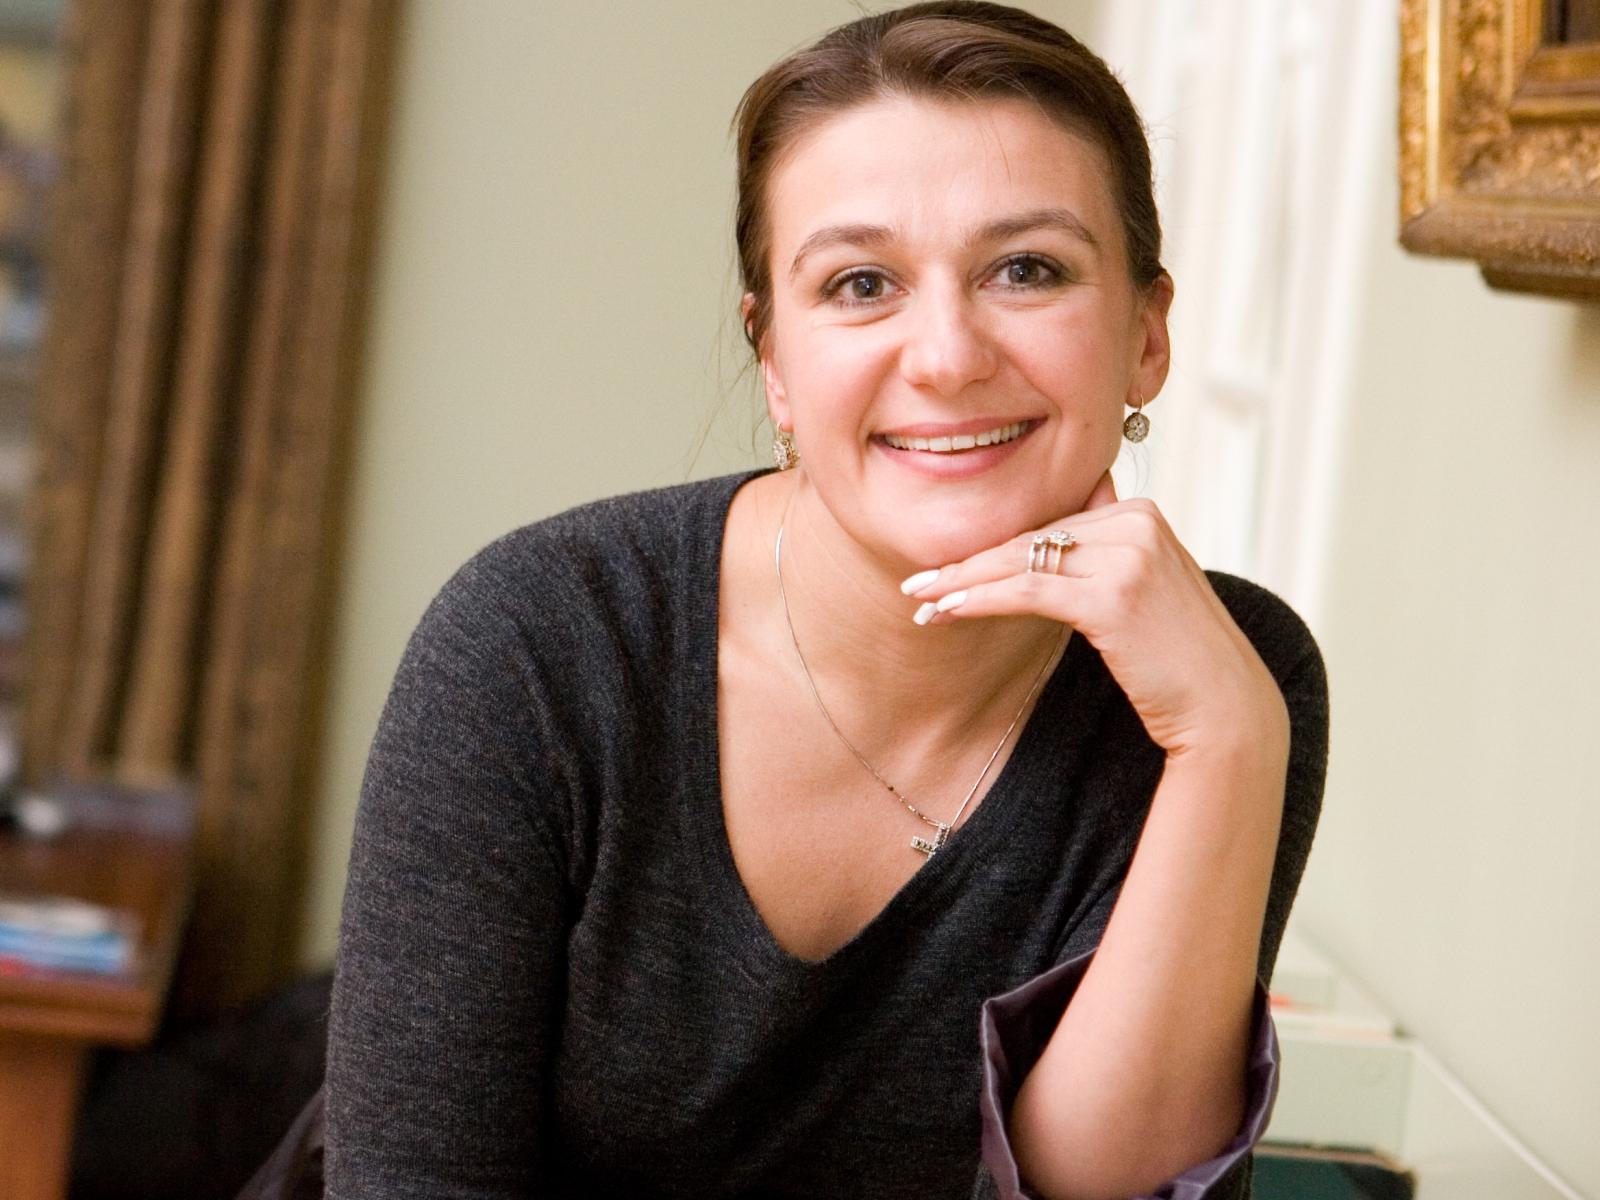 L'attrice russa Anastasija Rjurikovna Melnikova